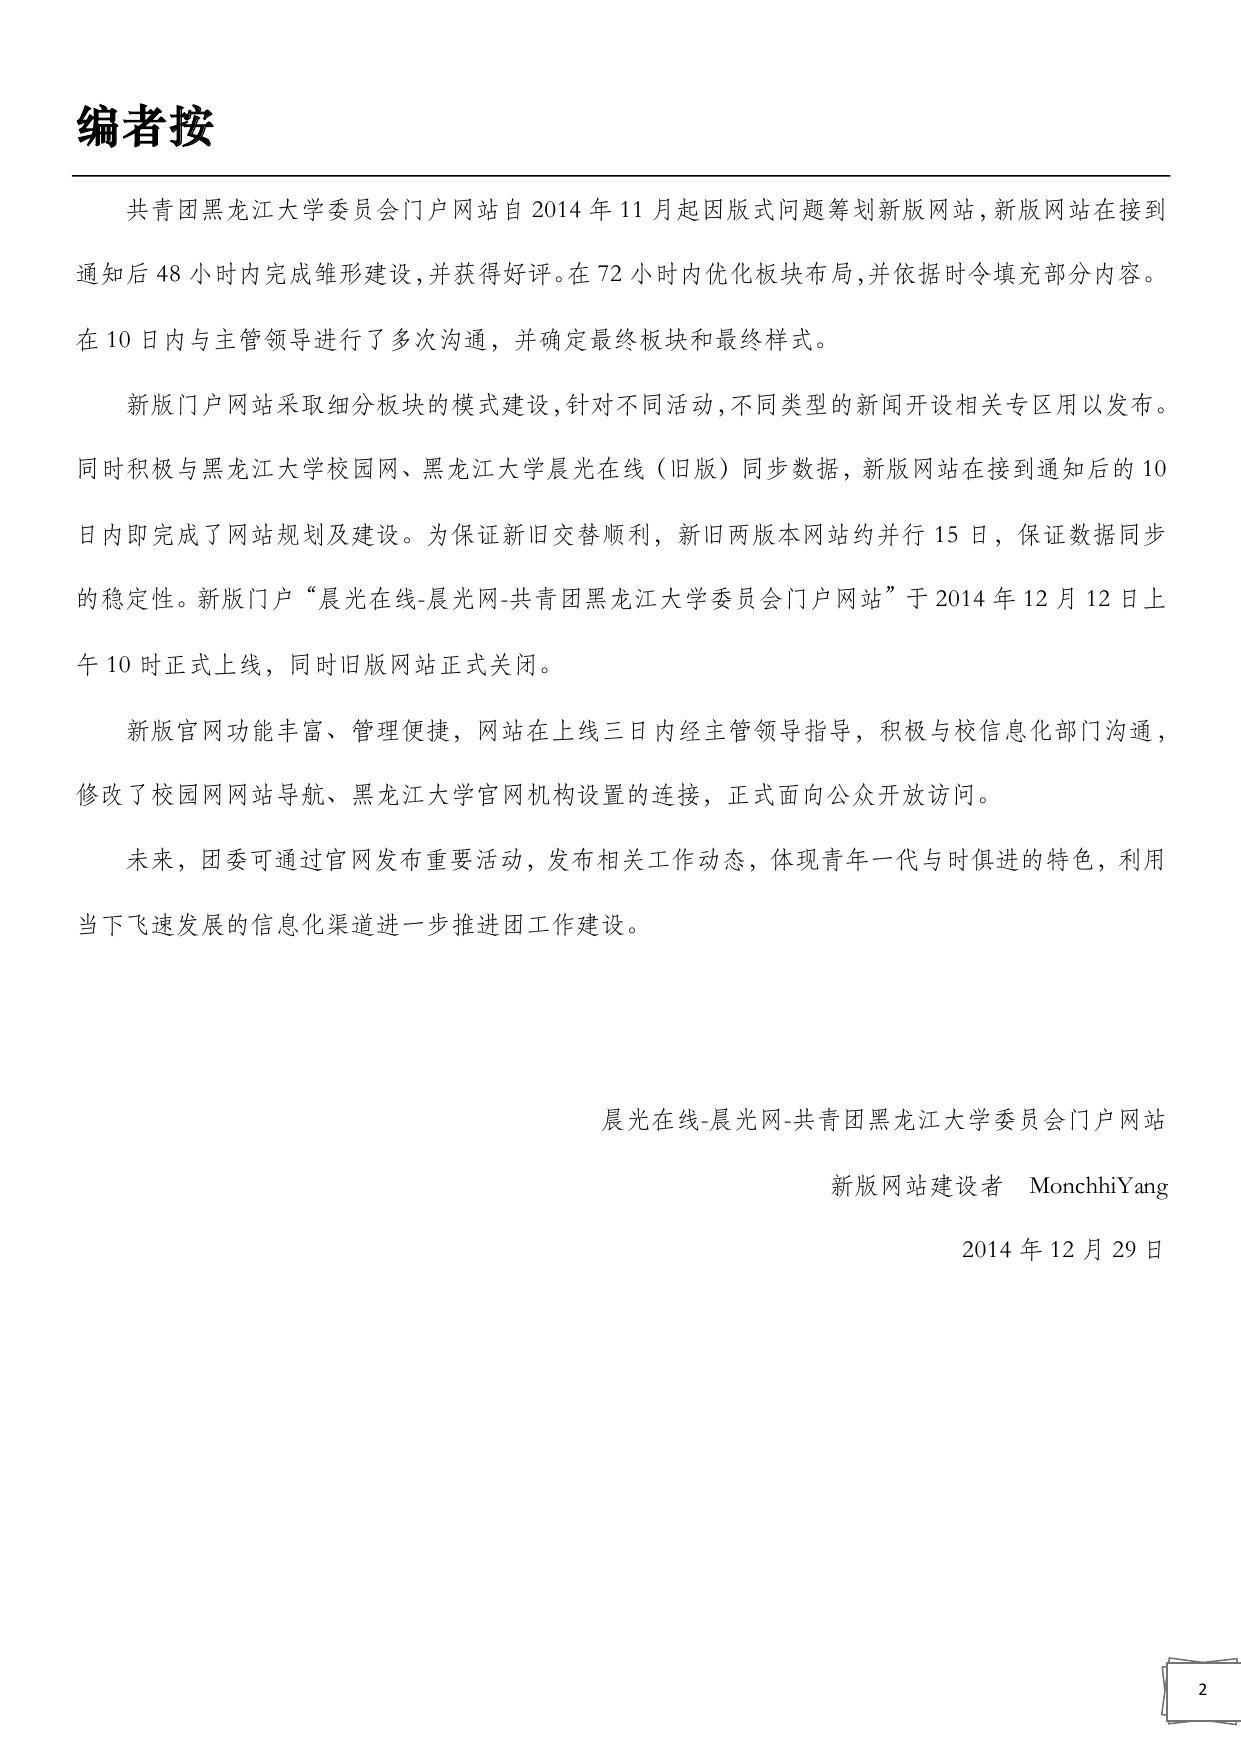 image-02.jpg